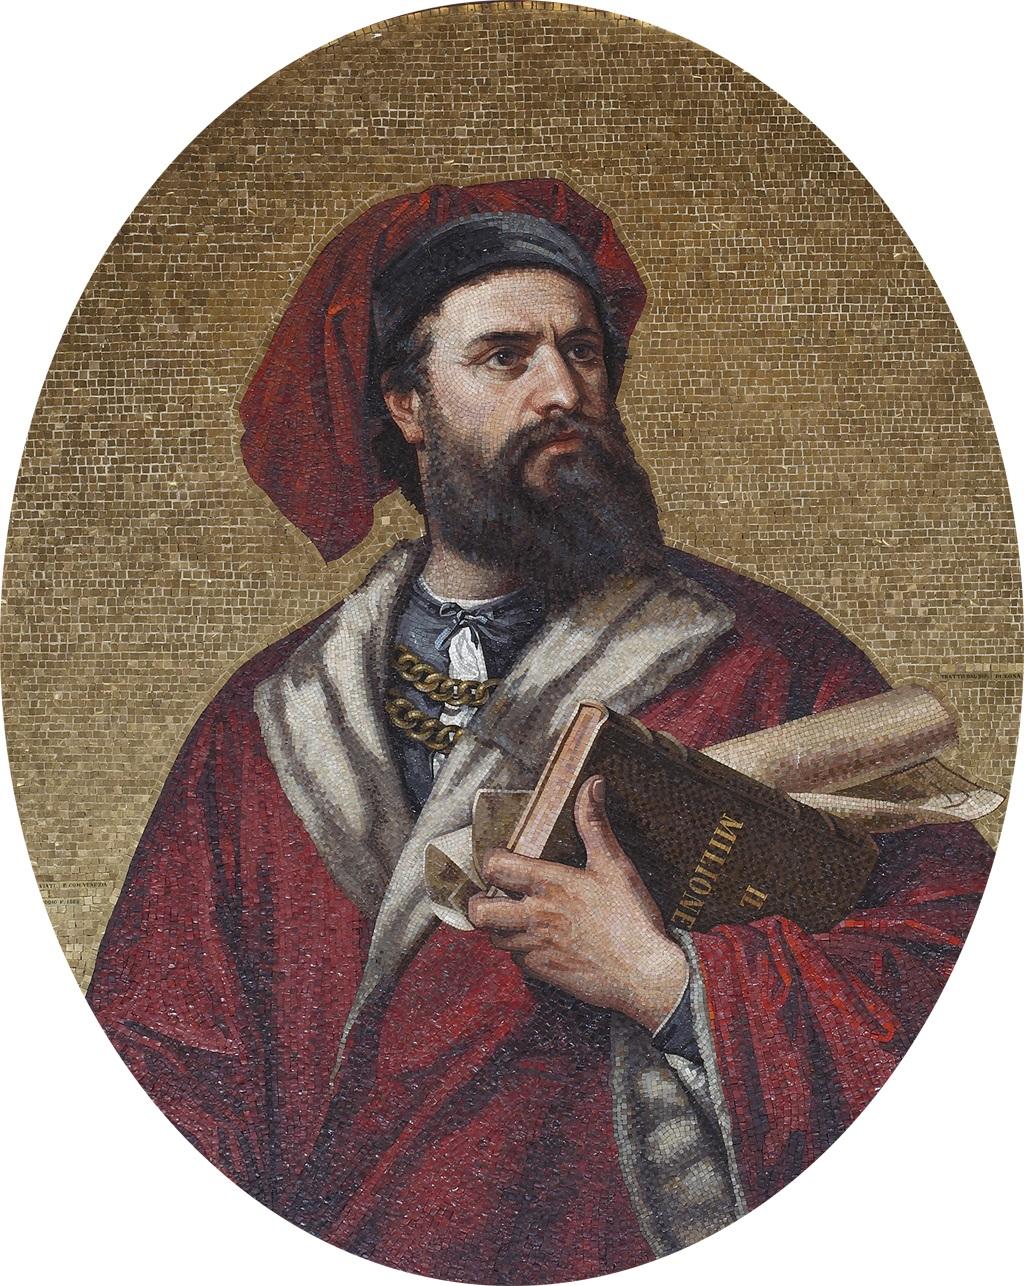 Marco_Polo_Mosaic_from_Palazzo_Tursi